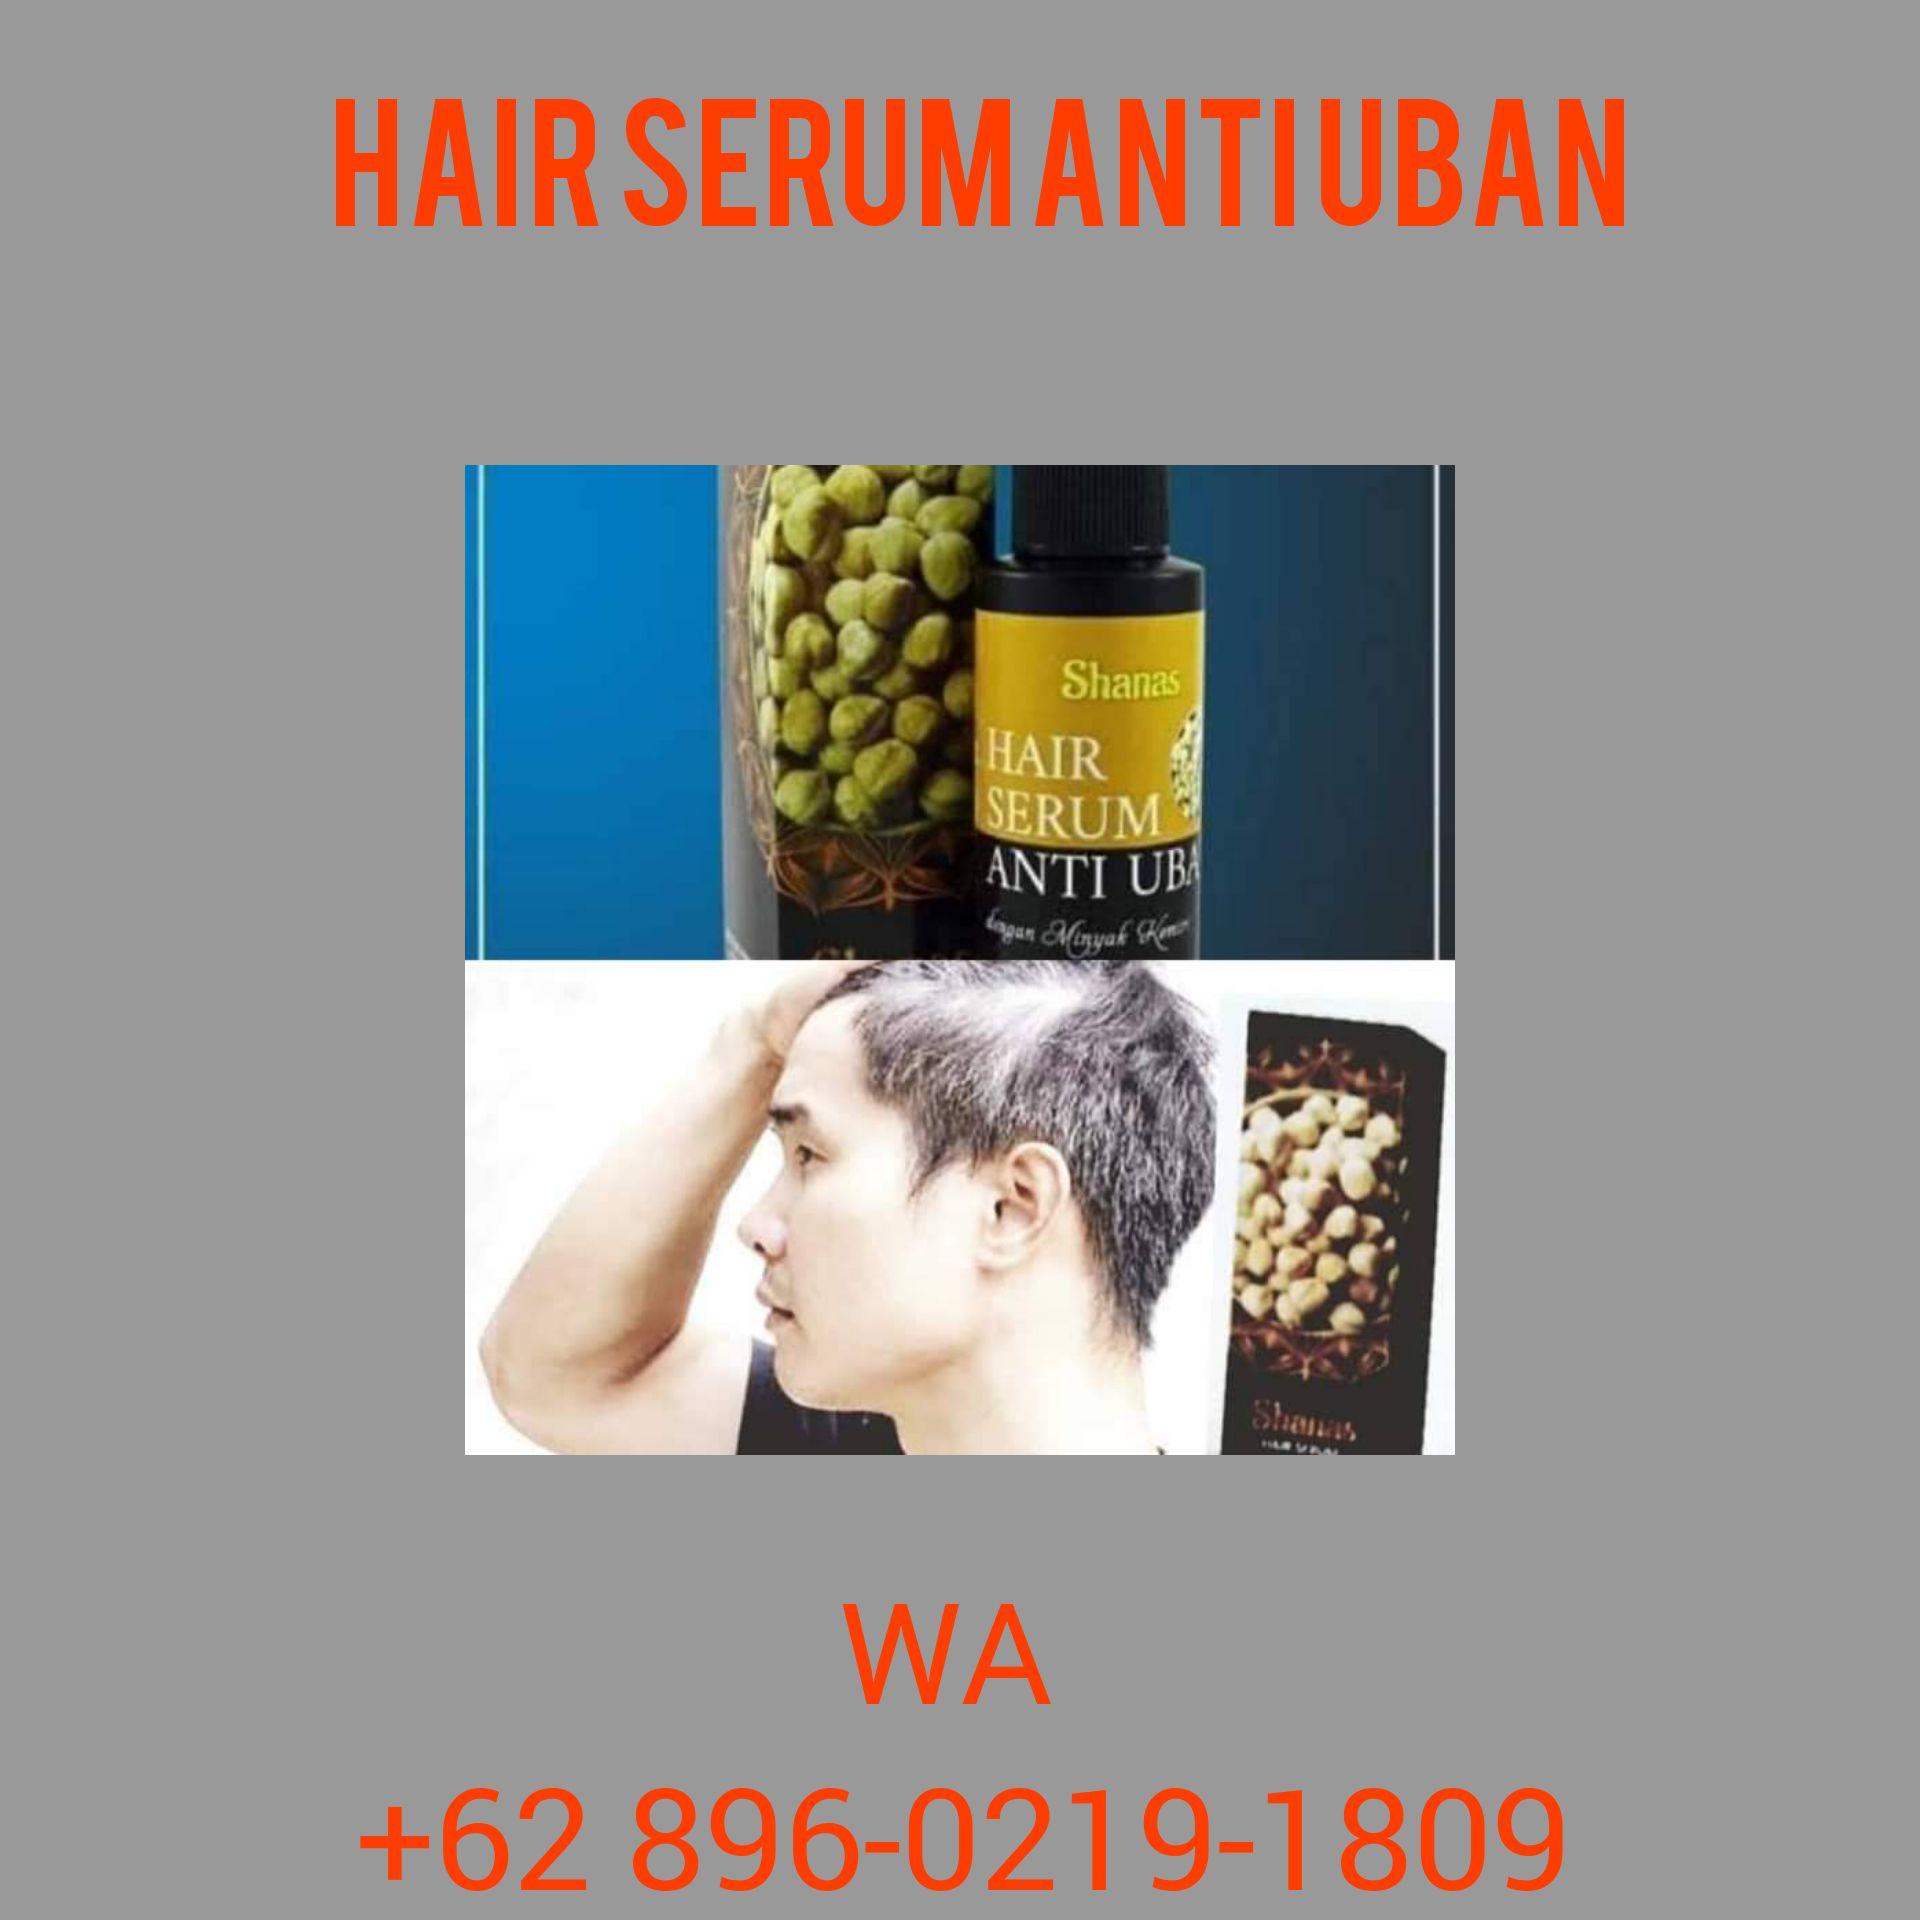 Terlaris Wa 62 896 0219 1809 Merawat Rambut Beruban Secara Tradisional Perawatan Rambut Alami Perawatan Rambut Rambut Alami